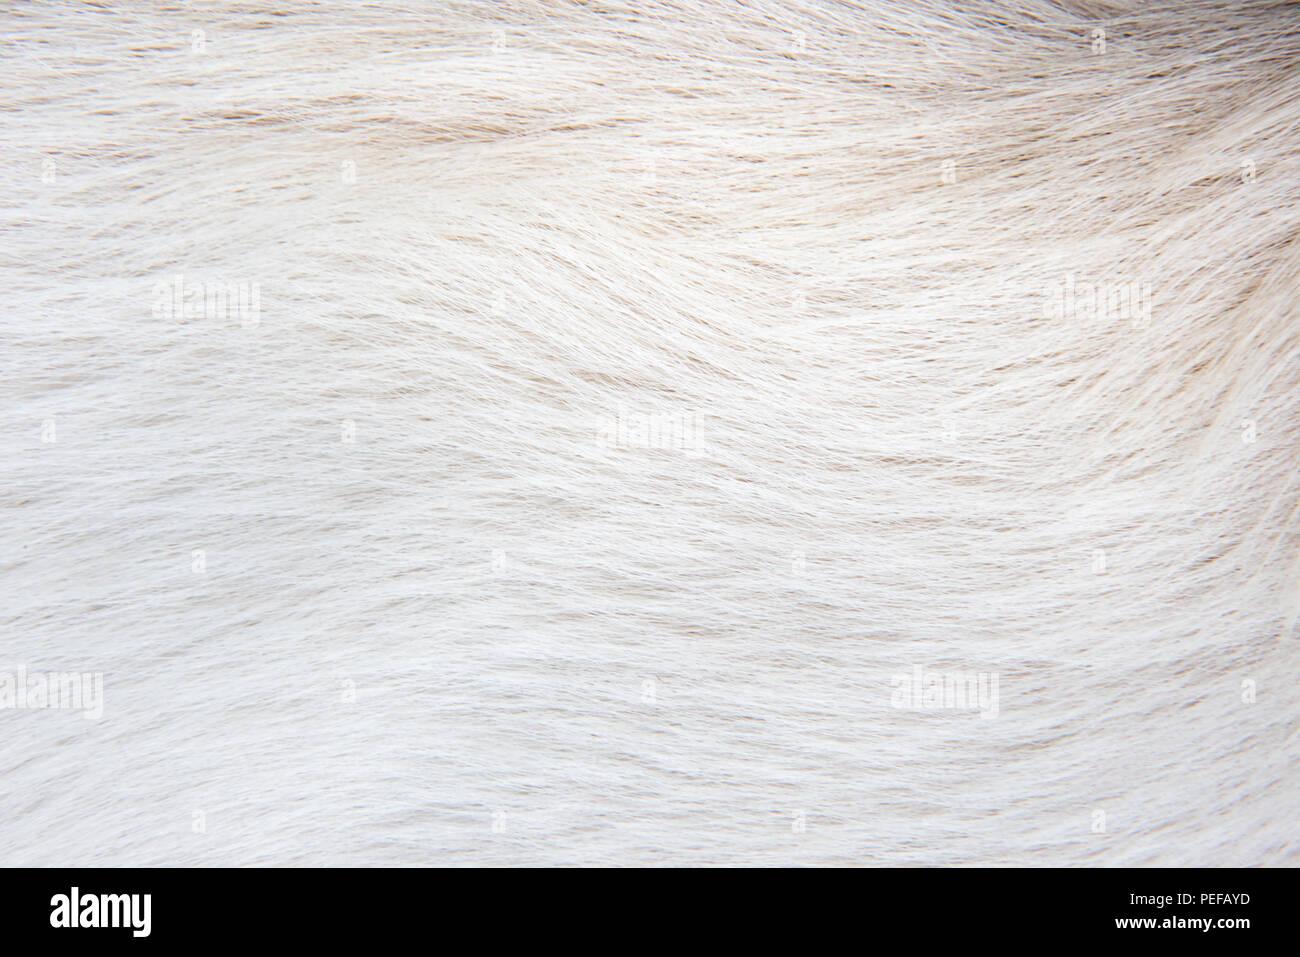 Texture white animal fur of a white dog - Stock Image